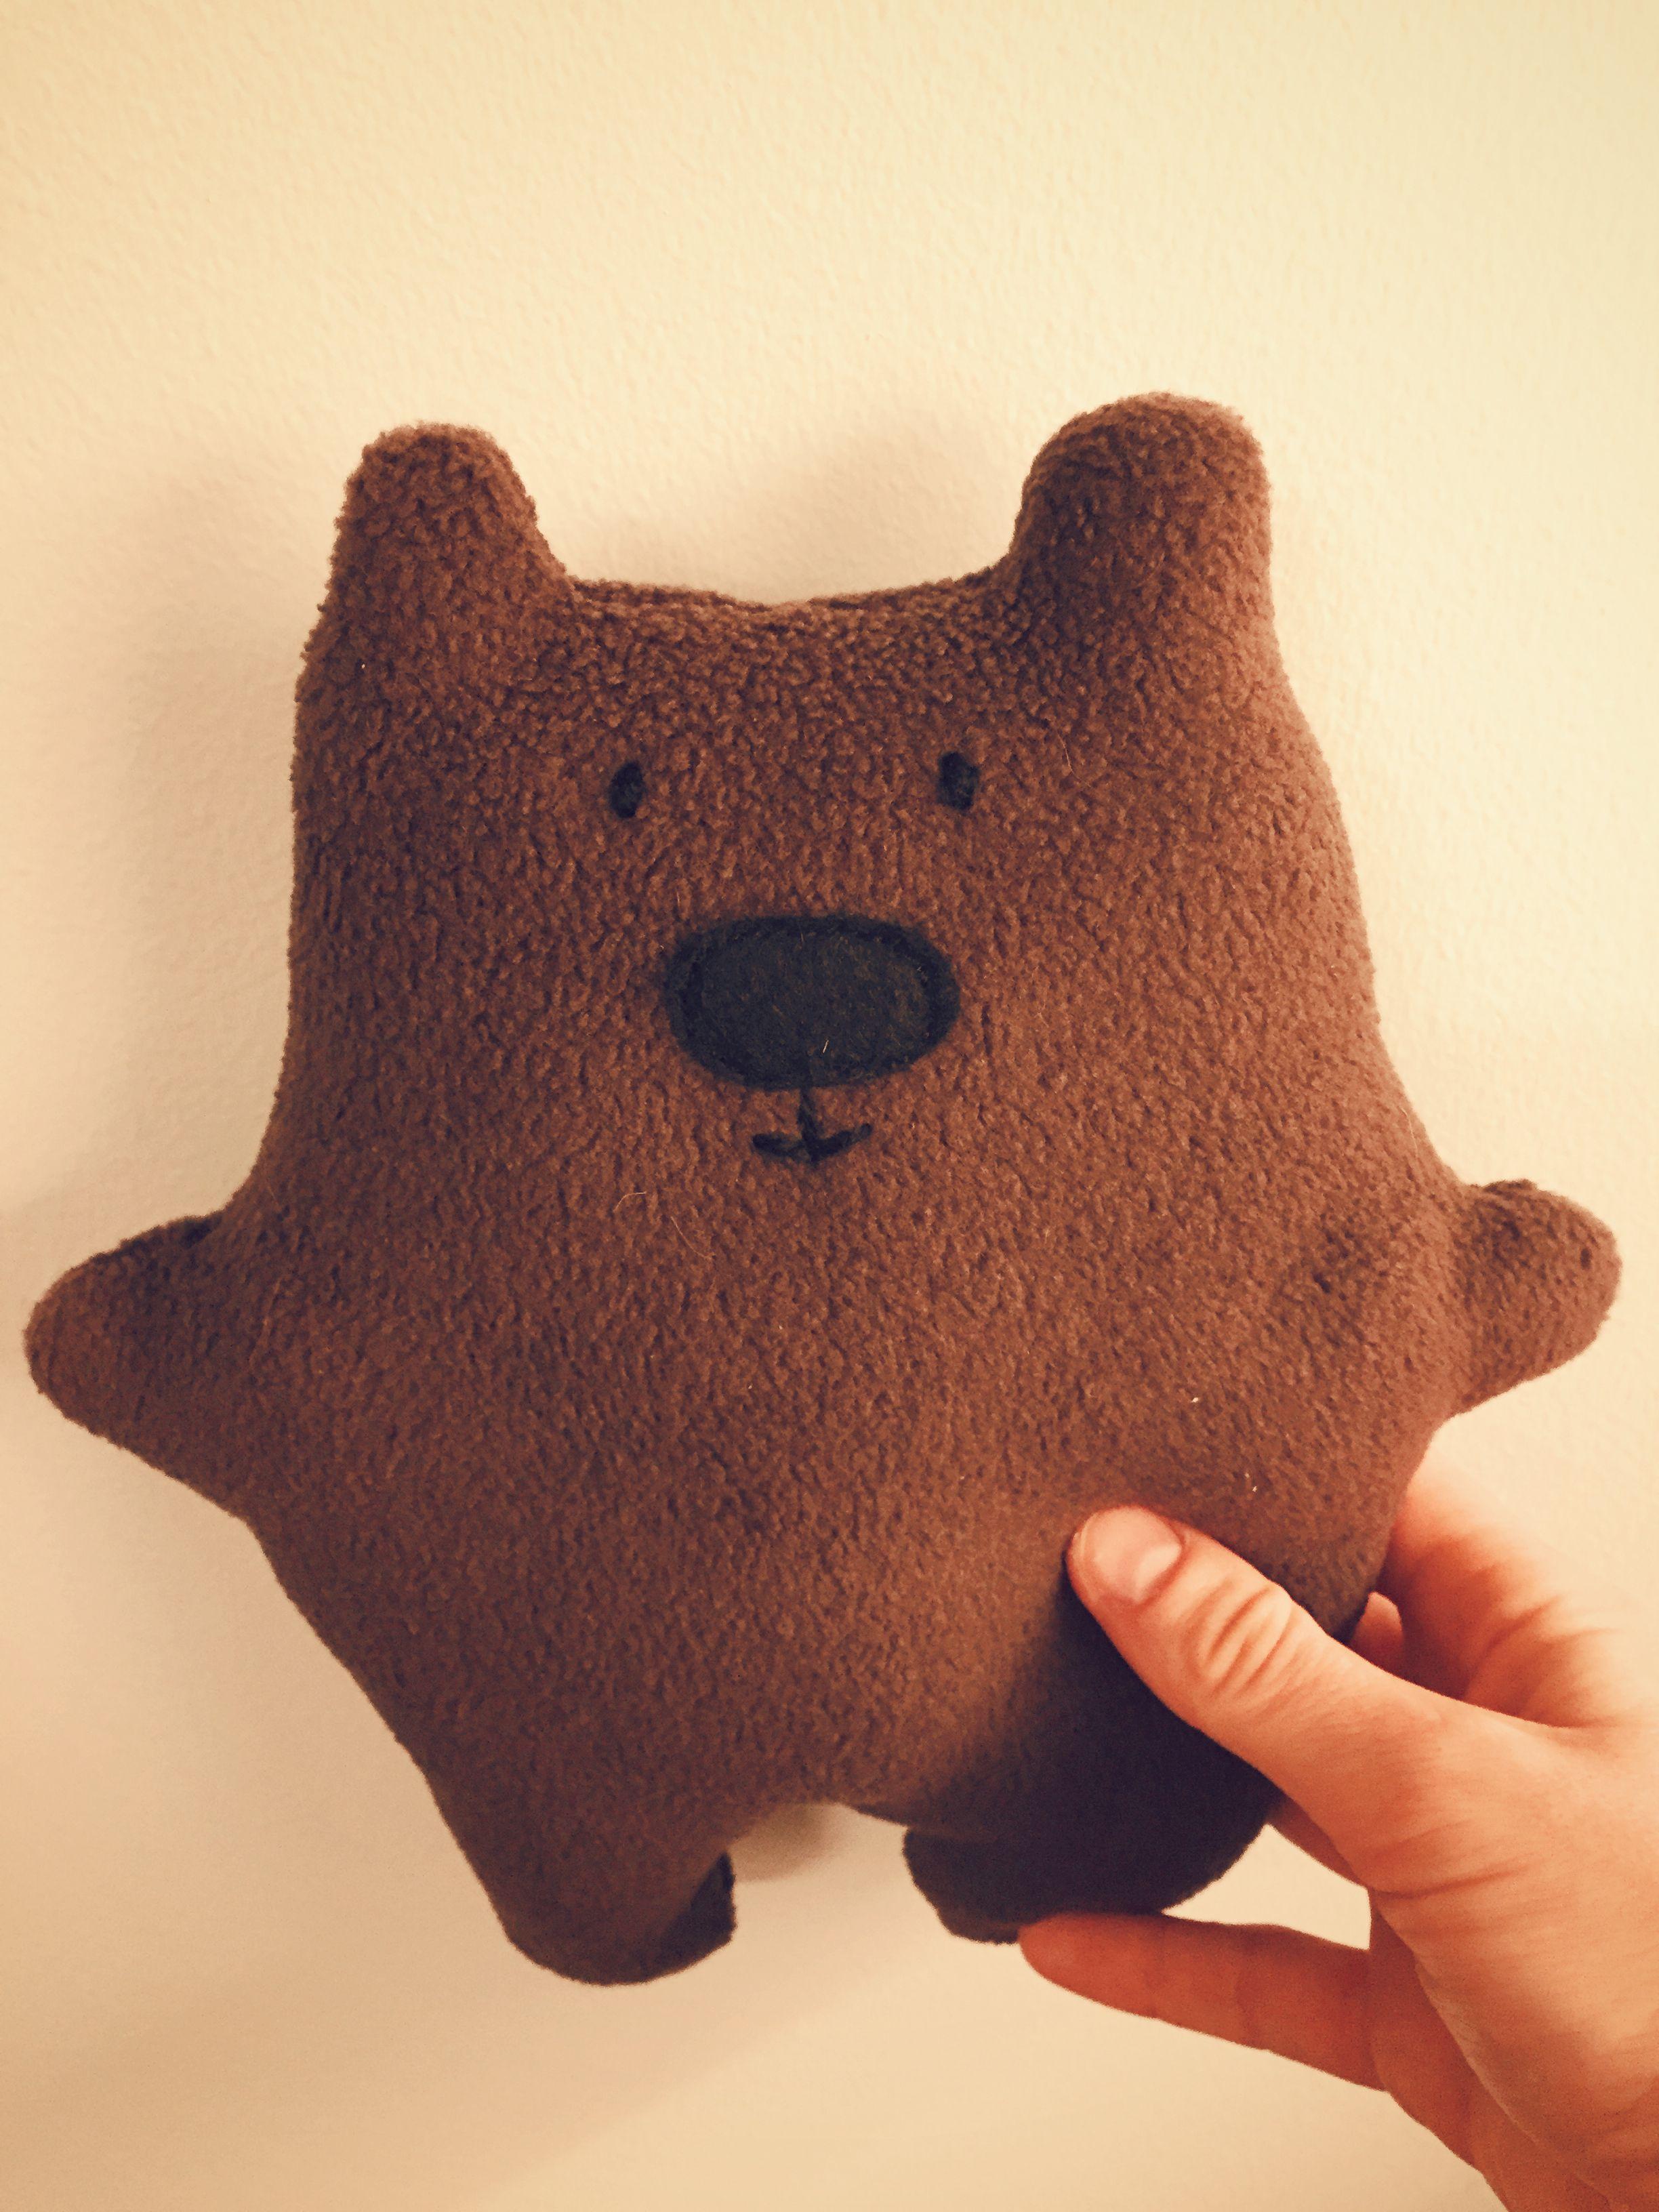 DIY Easy Teddy Bear FREE Sewing Pattern and Tutorial